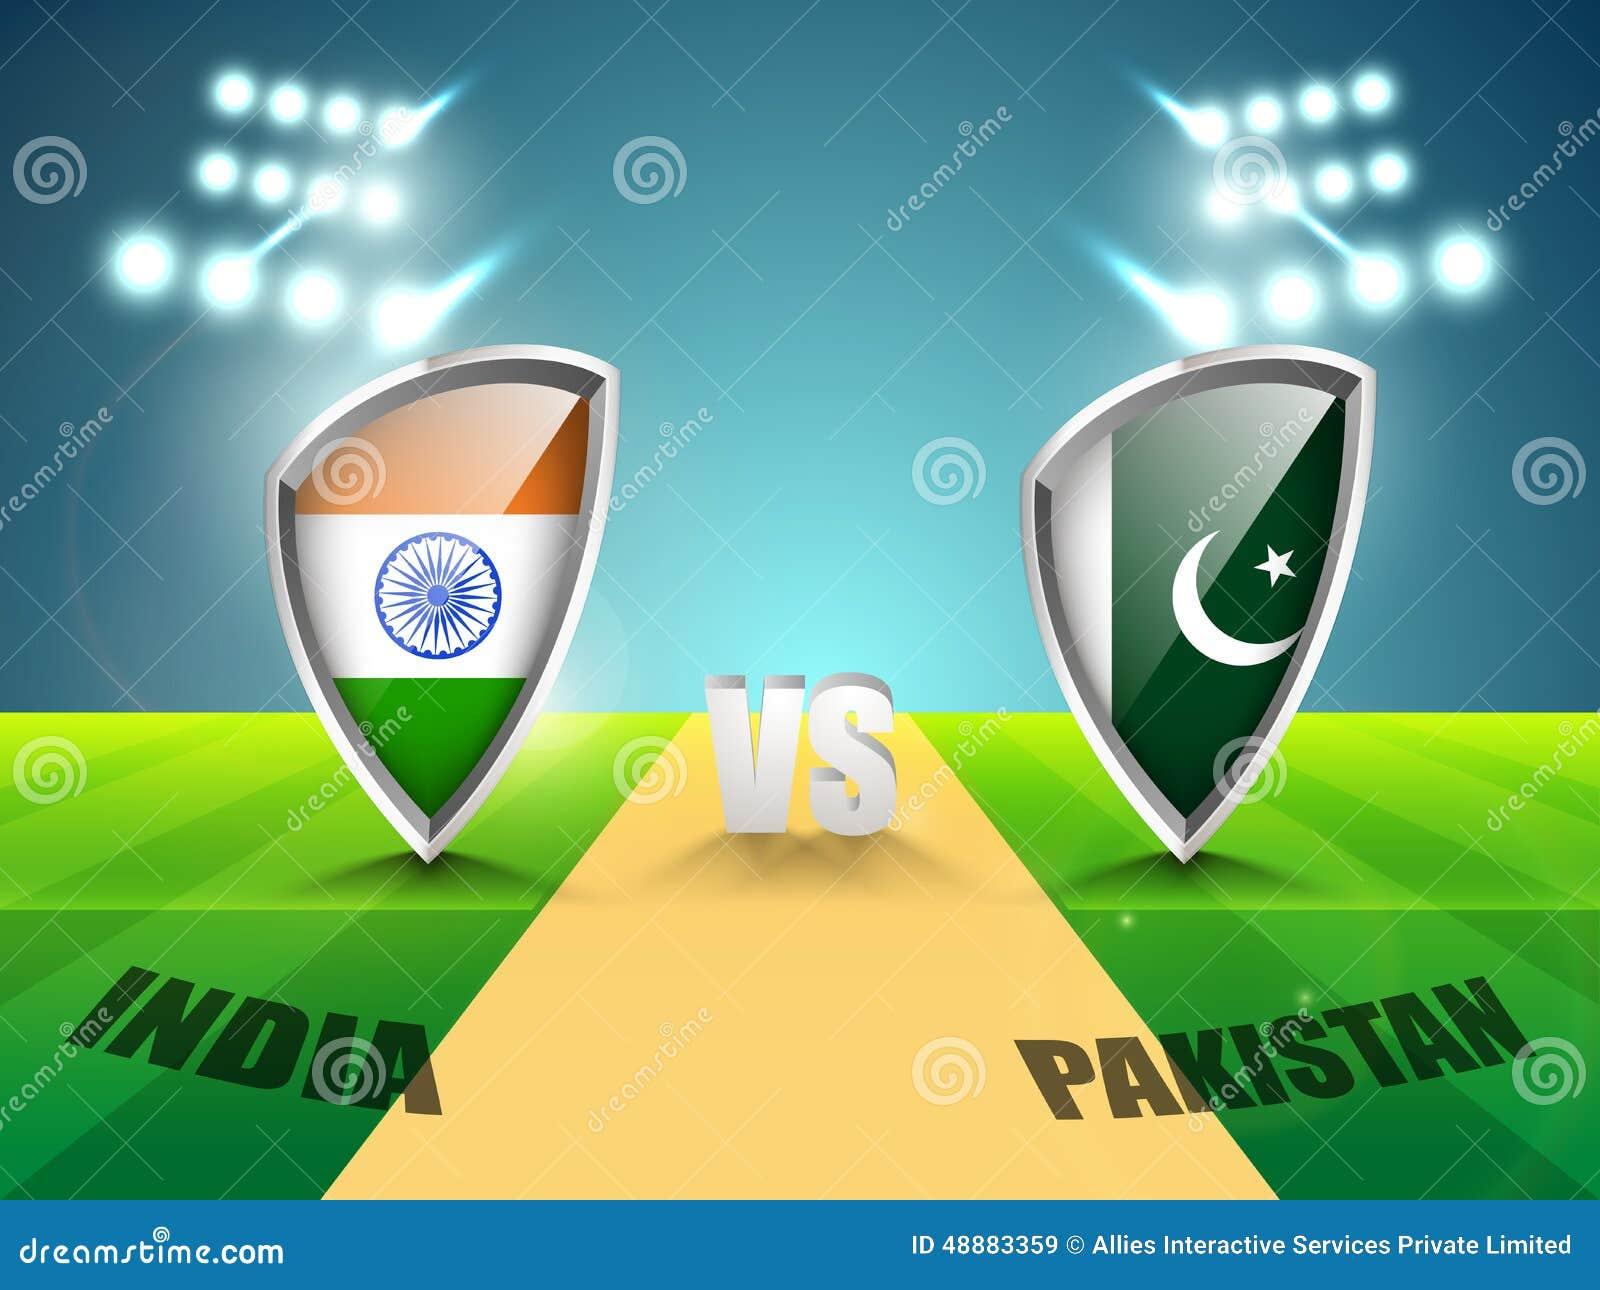 Download India Vs Pakistan Cricket Match Concept. Stock Illustration - Illustration of inning, holiday: 48883359